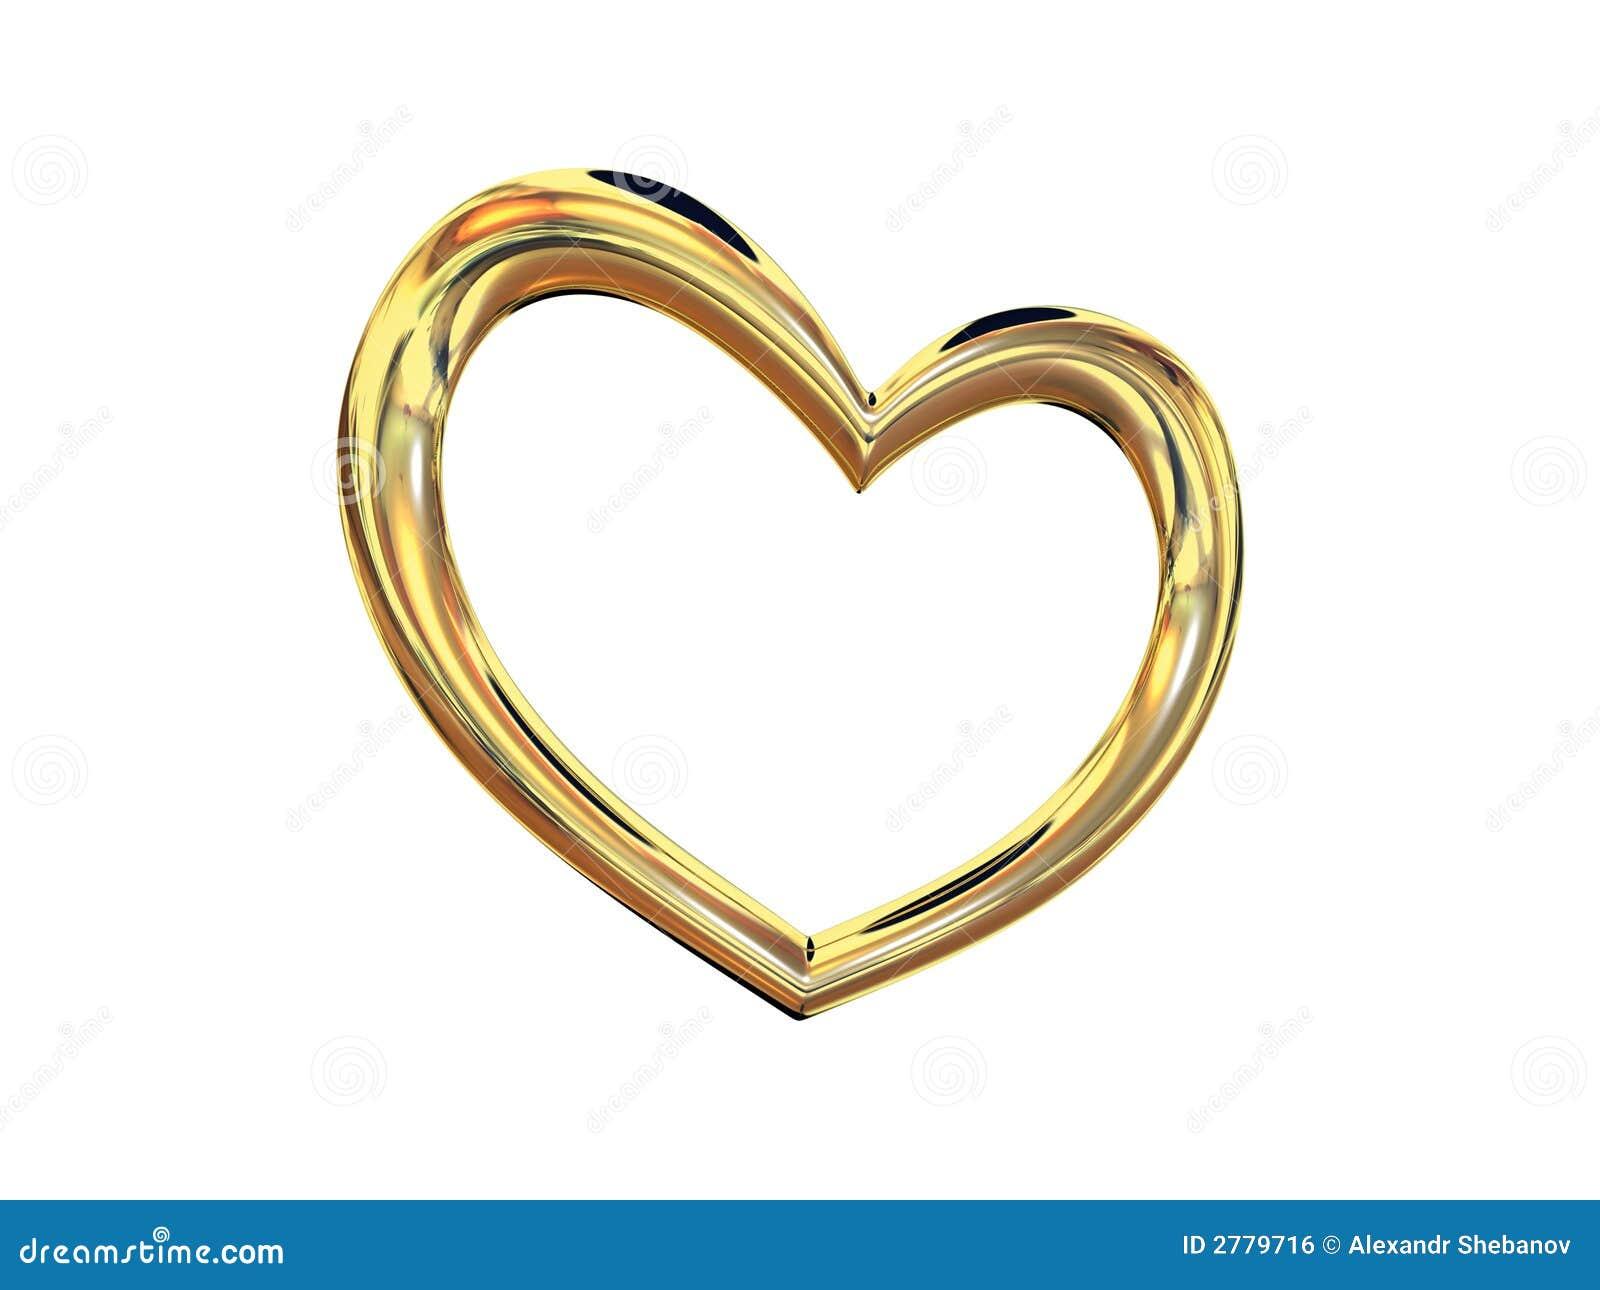 Heart gold costume jewellery